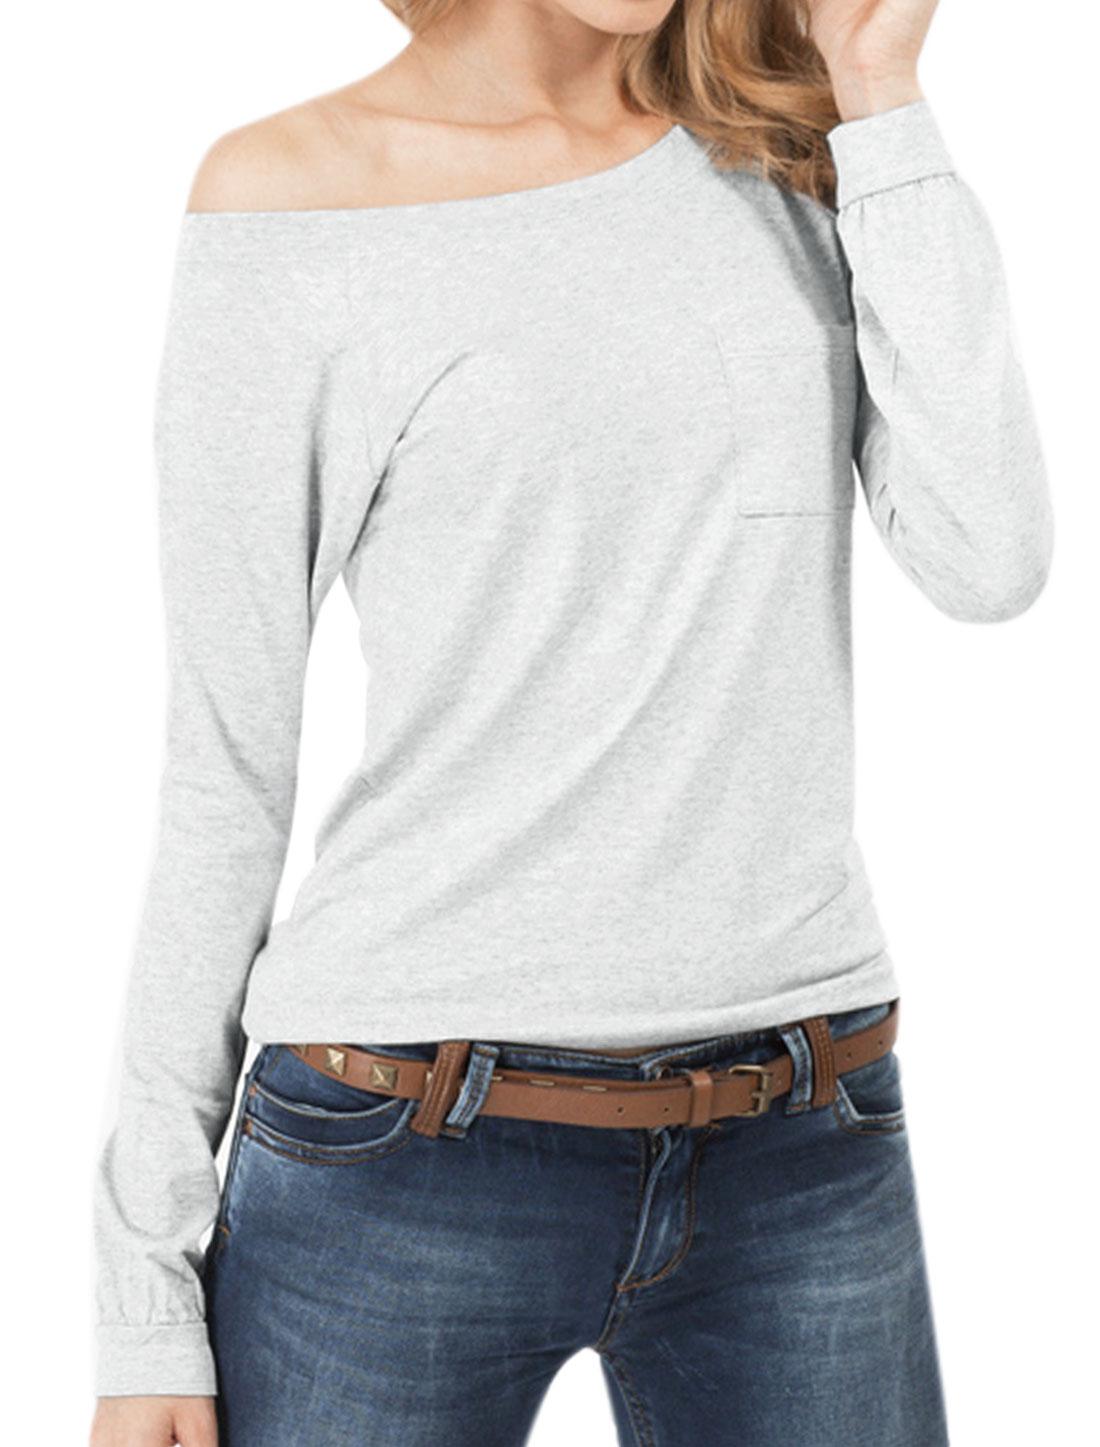 Women Raglan Sleeves Slim Fit Tee Shirt w Pocket Gray M